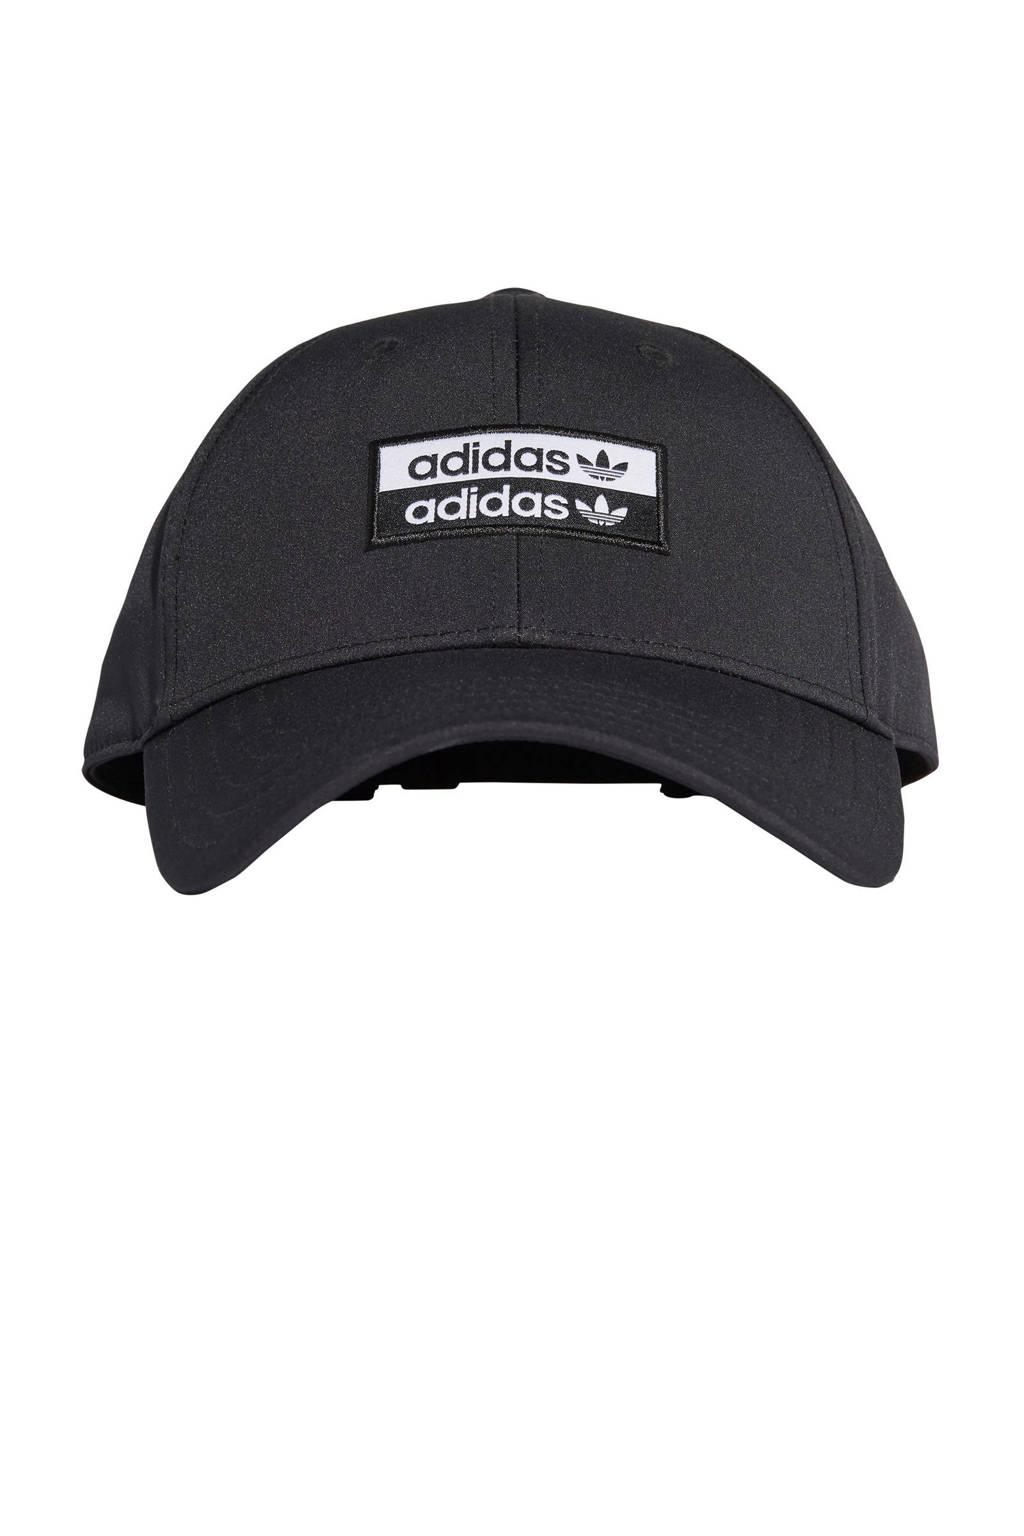 adidas Originals pet zwart/wit, Zwart/wit